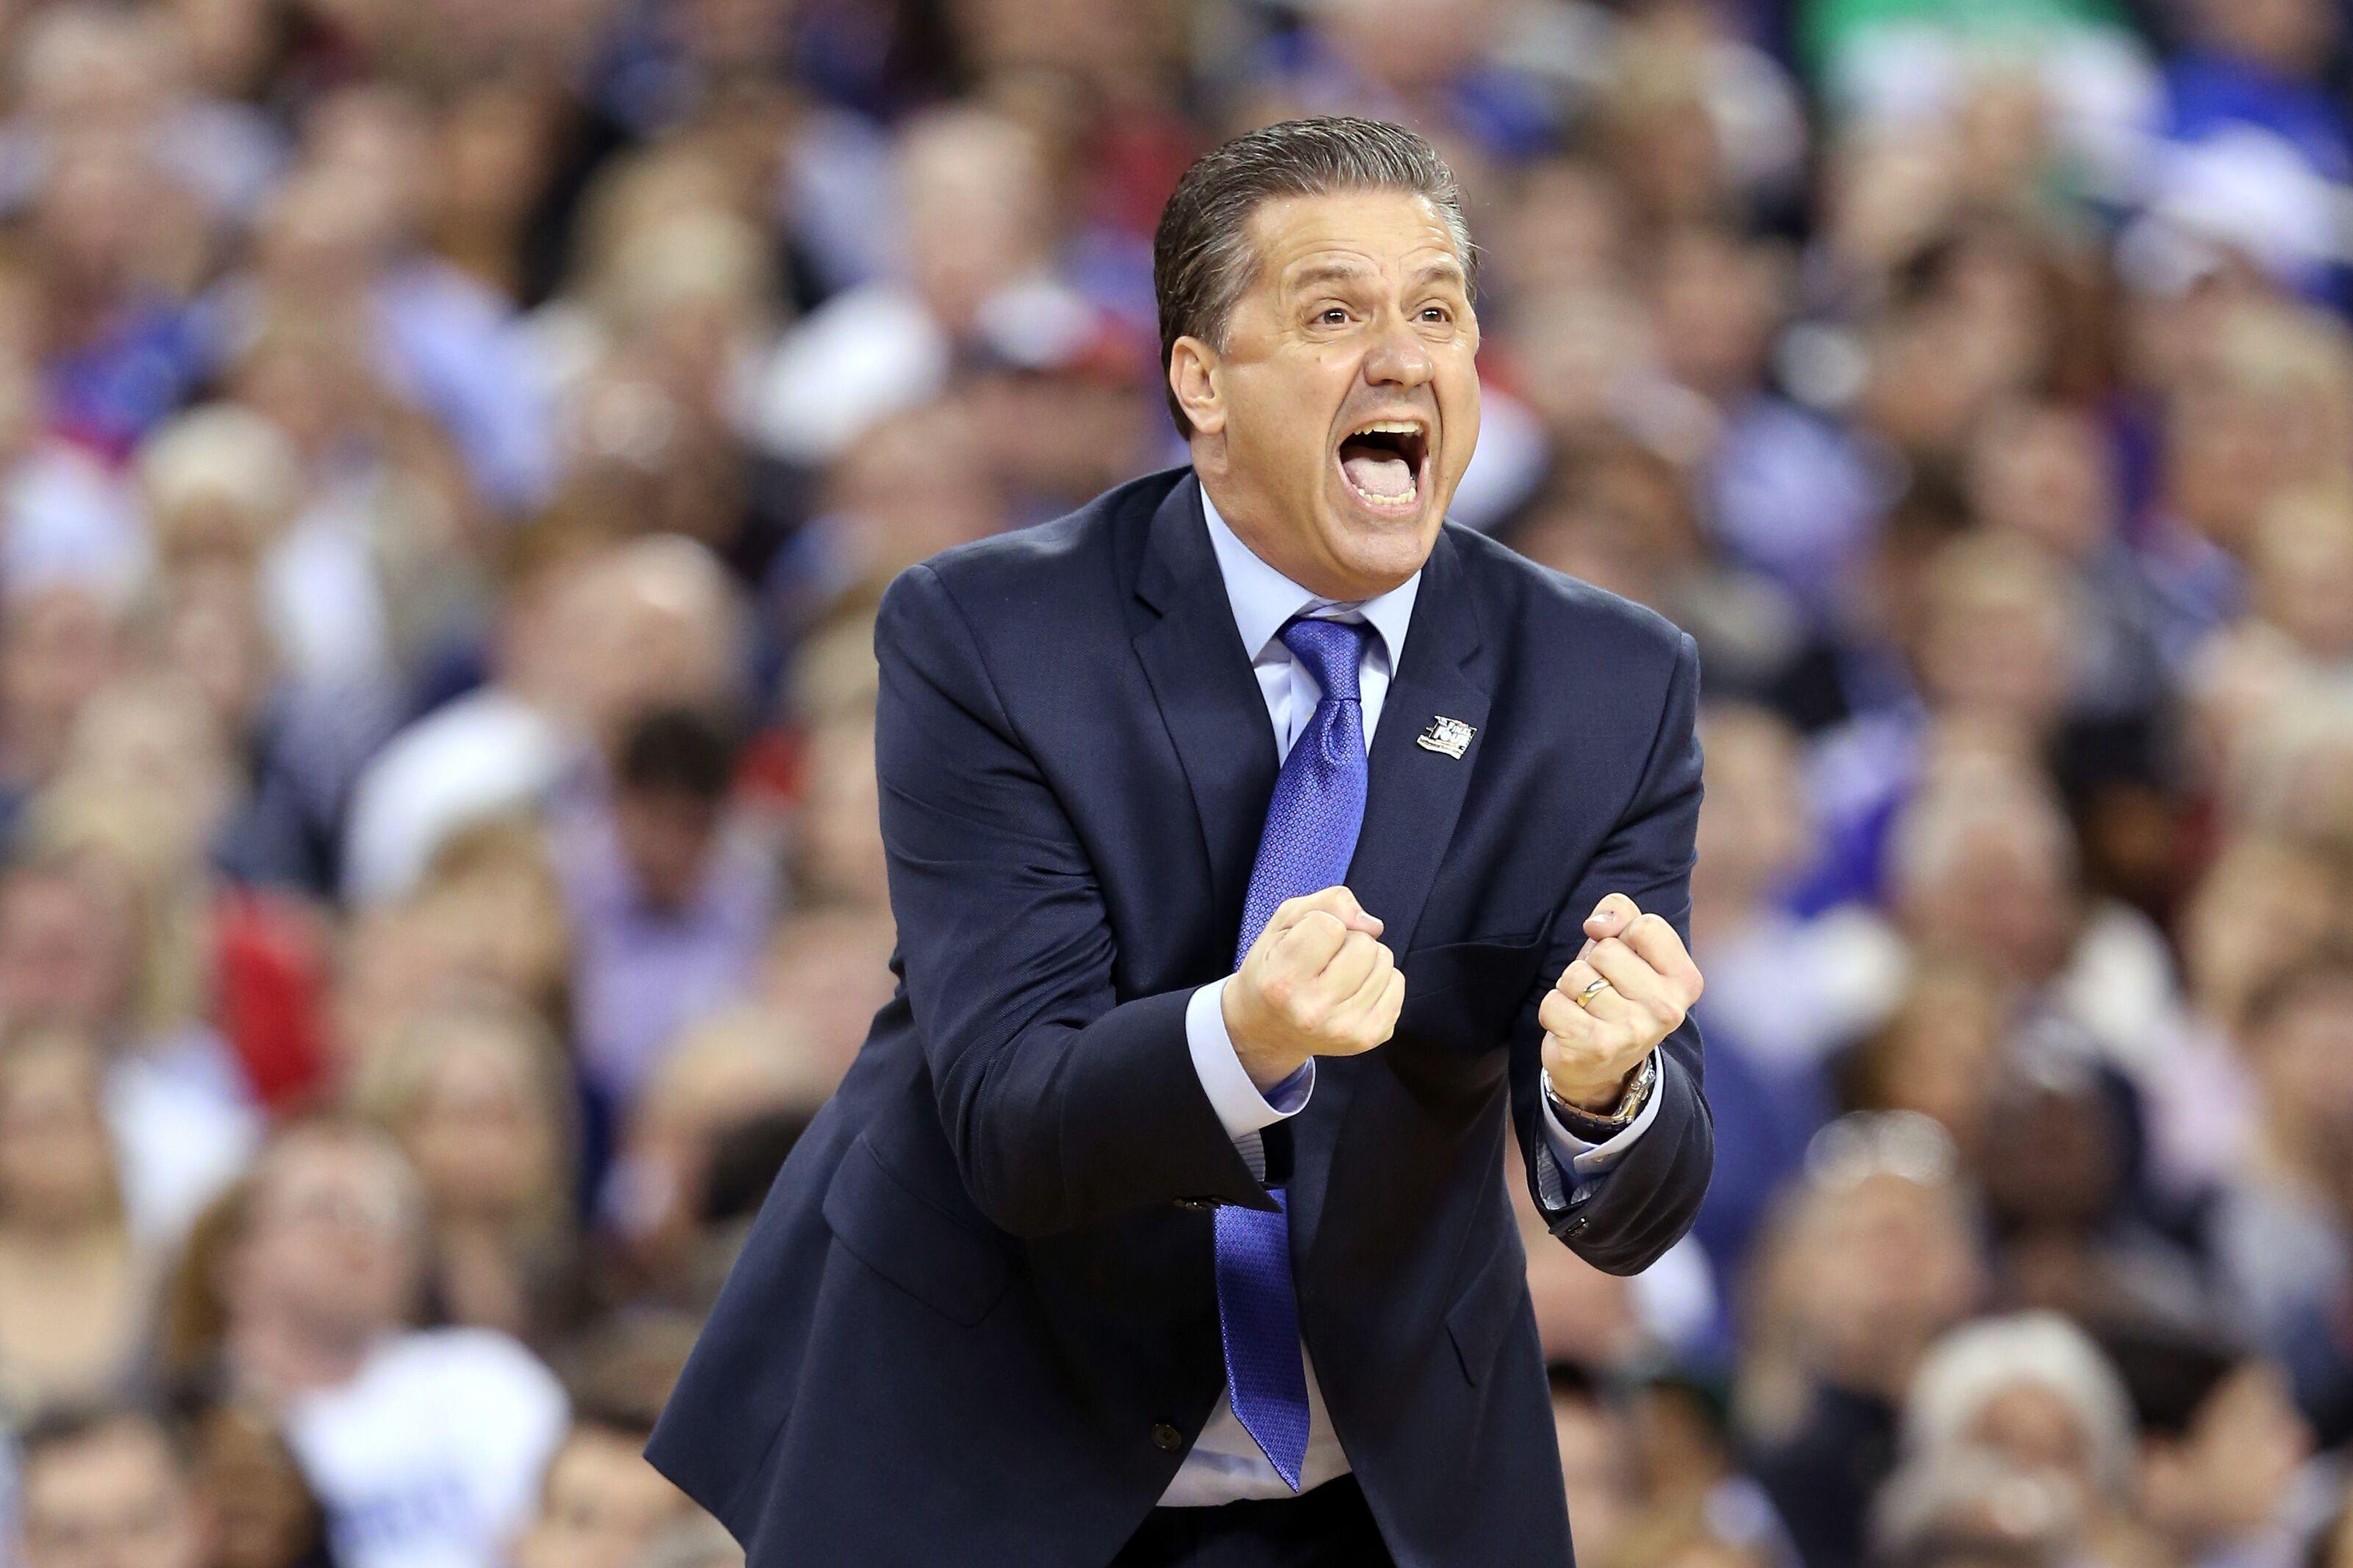 2013 Recruits Uk Basketball And Football Recruiting News: Kentucky Basketball: John Calipari's 5 Best Recruiting Classes